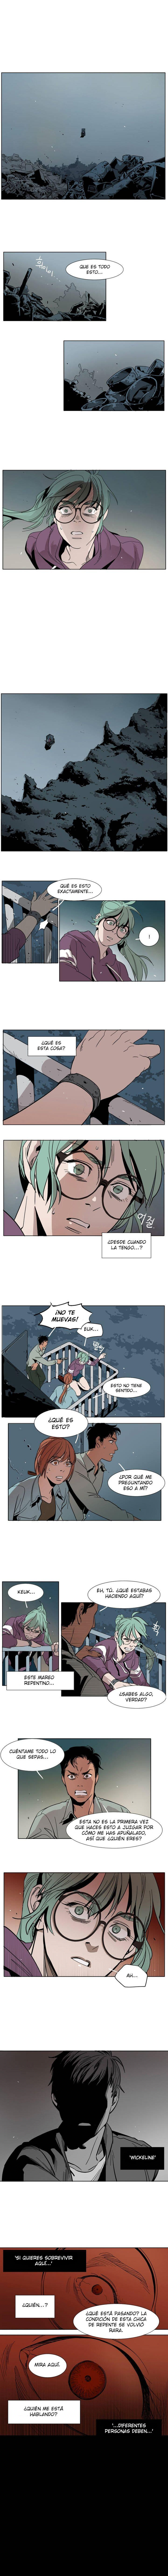 https://c9.mangatag.com/es_manga/pic4/17/24977/626171/f985293a0ce1b928e5a58489f086165f.jpg Page 5